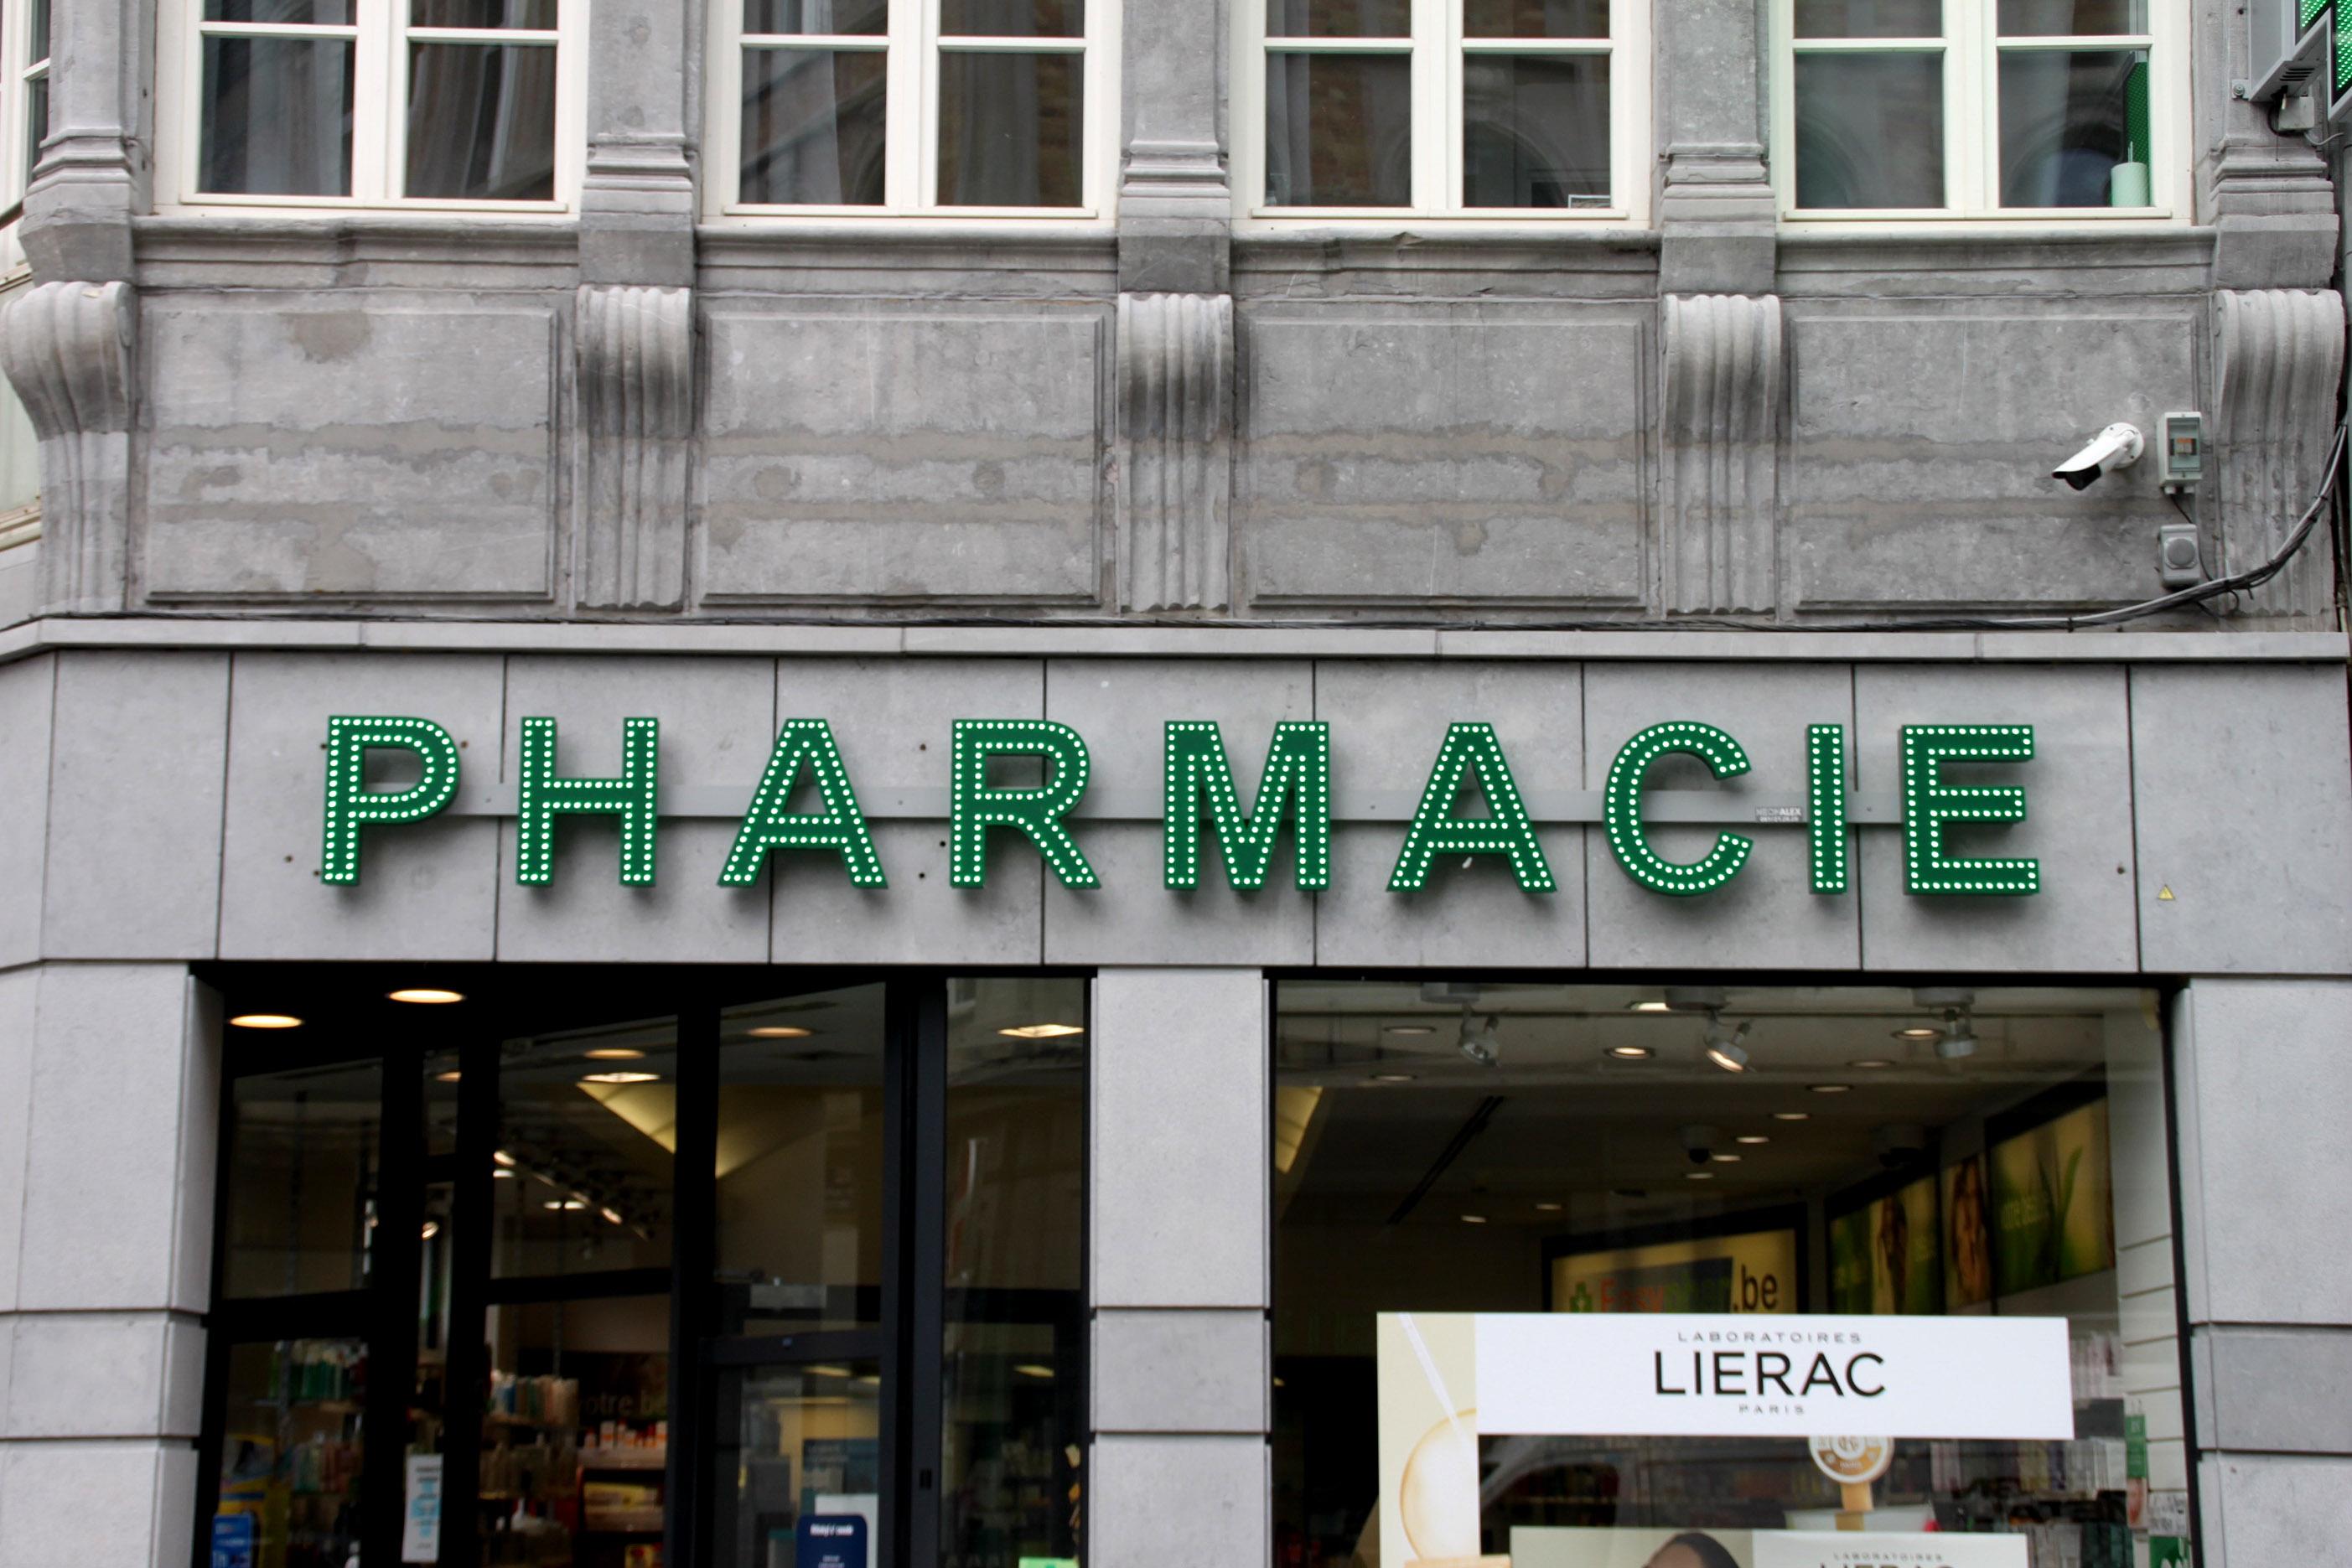 Enseigne et croix de pharmacie EasyPha